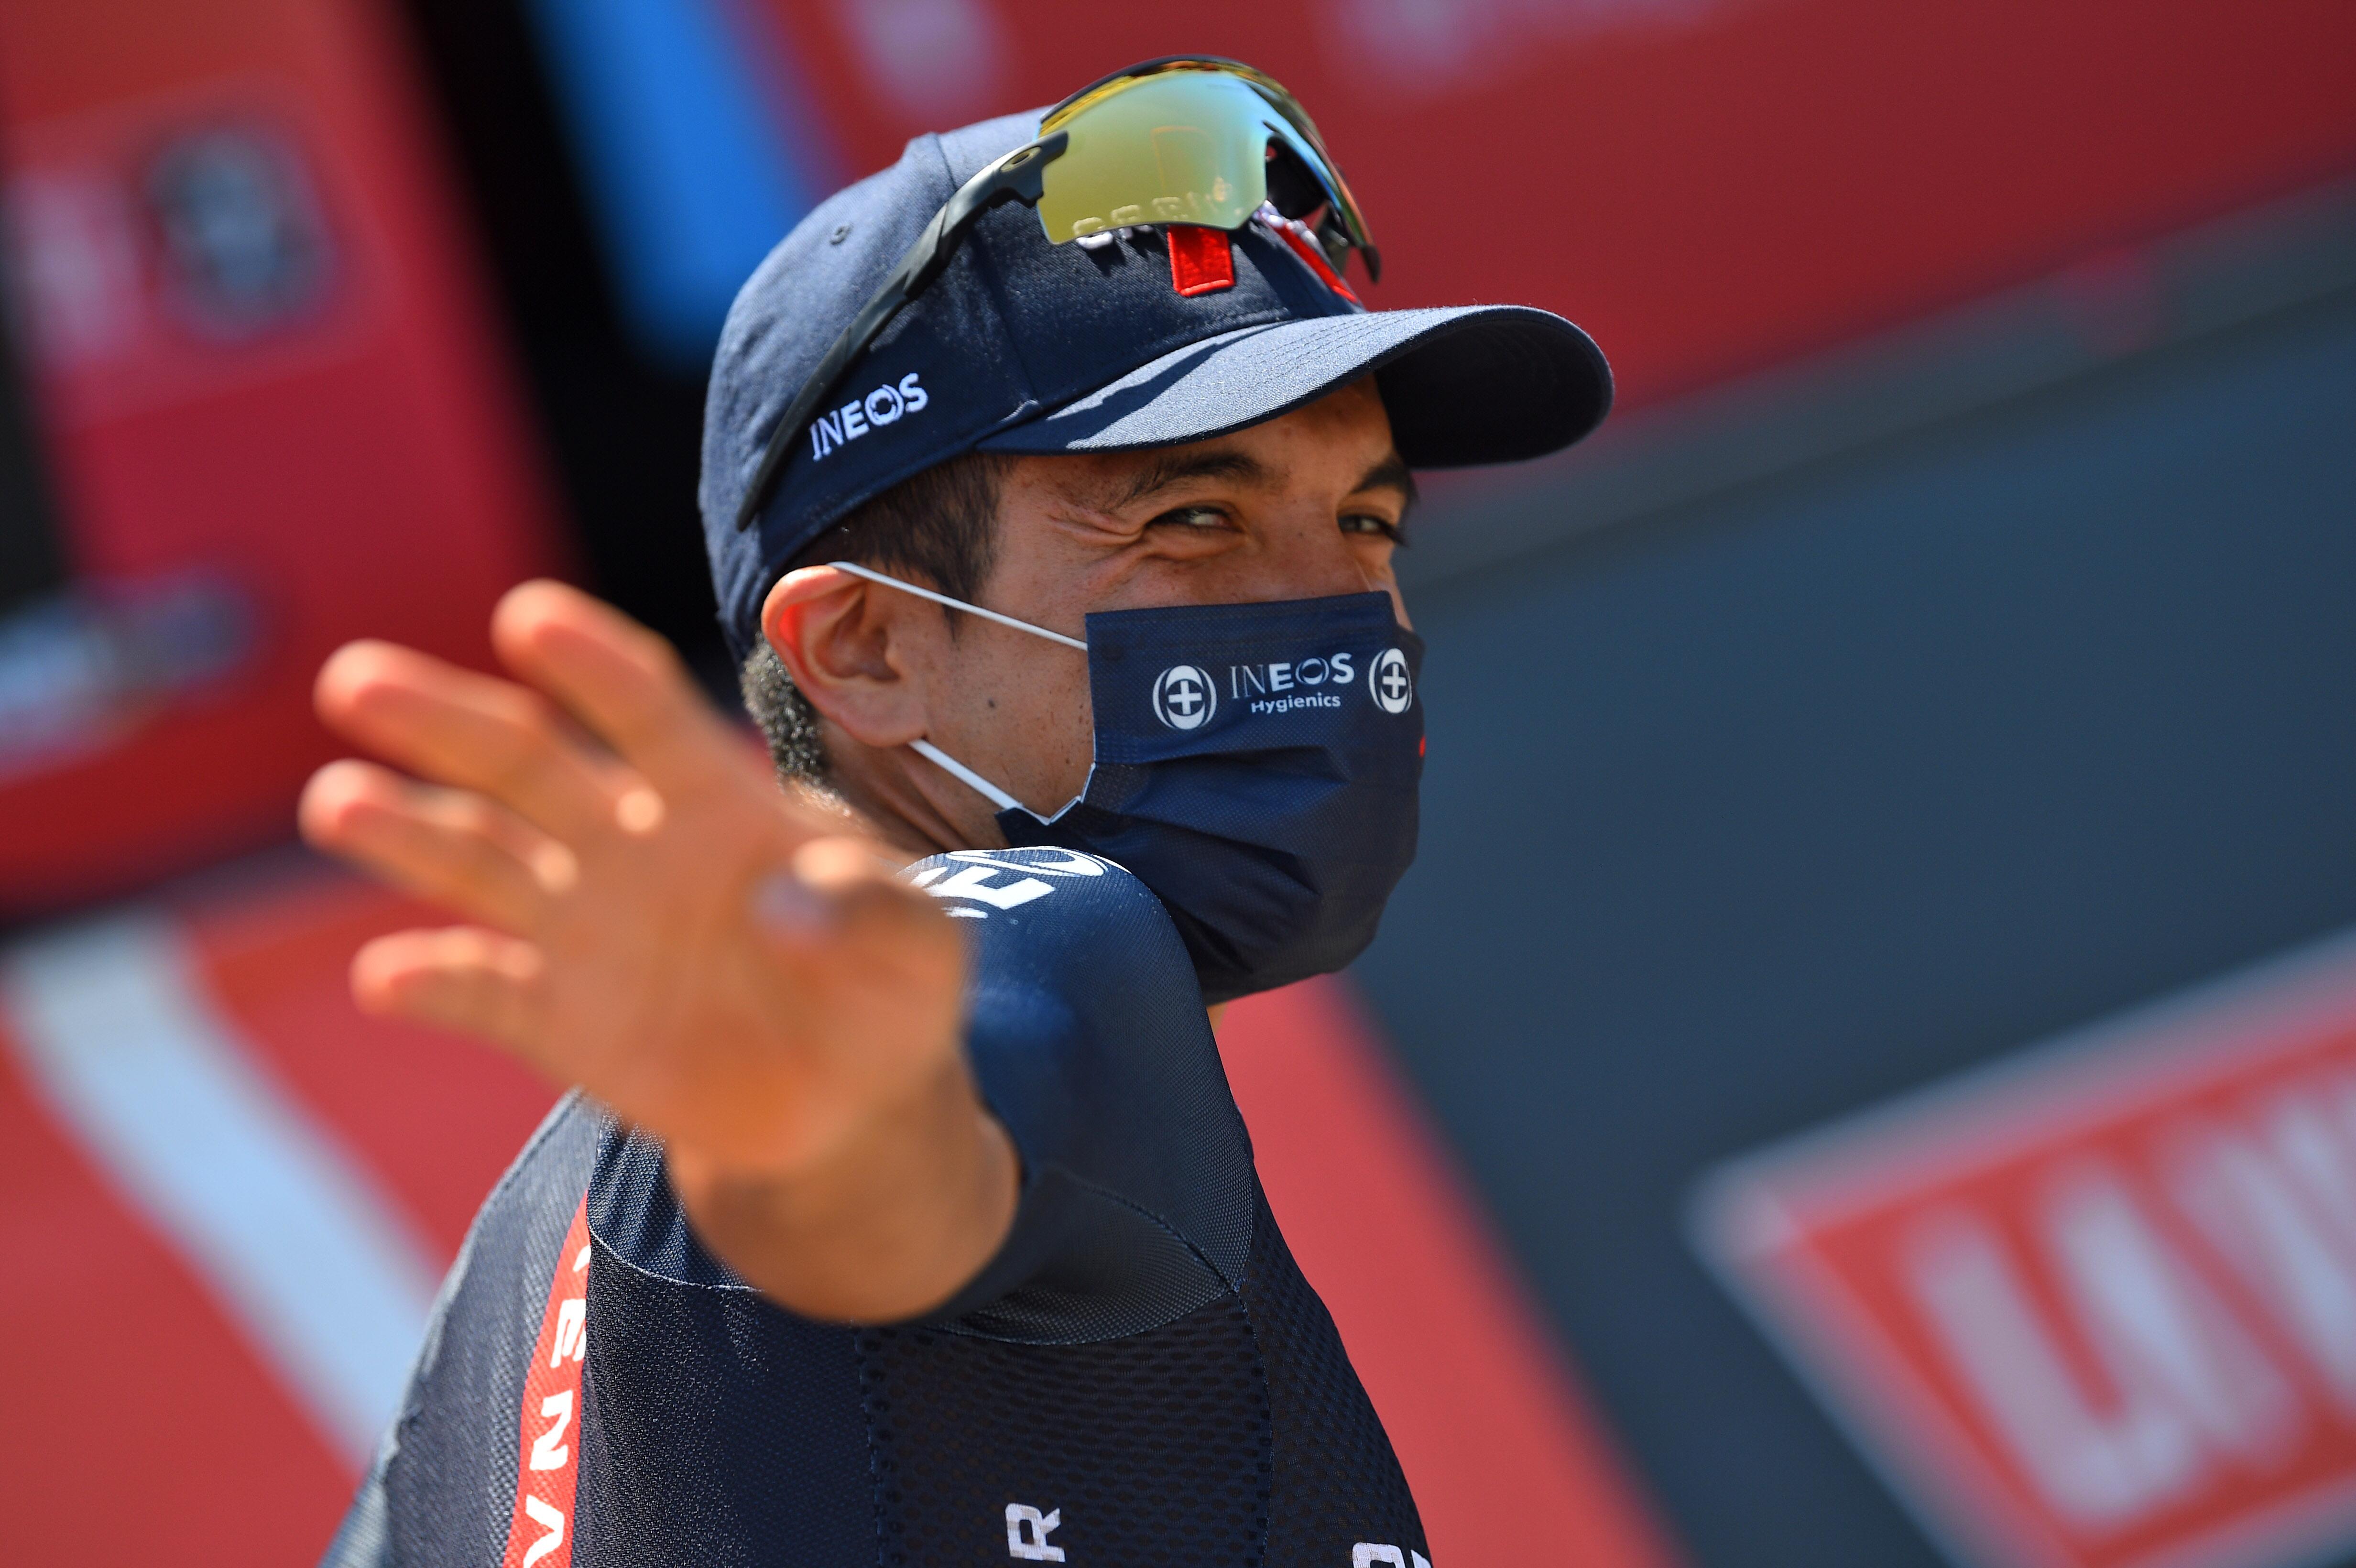 Vuelta Espana 2021 - 76th Edition - 11th stage Antequera - Valdepenas de Jaen 133,6 km - 25/08/2021 - Richard Carapaz (ECU - Ineos Grenadiers) - photo Dario Belingheri/BettiniPhoto©2021